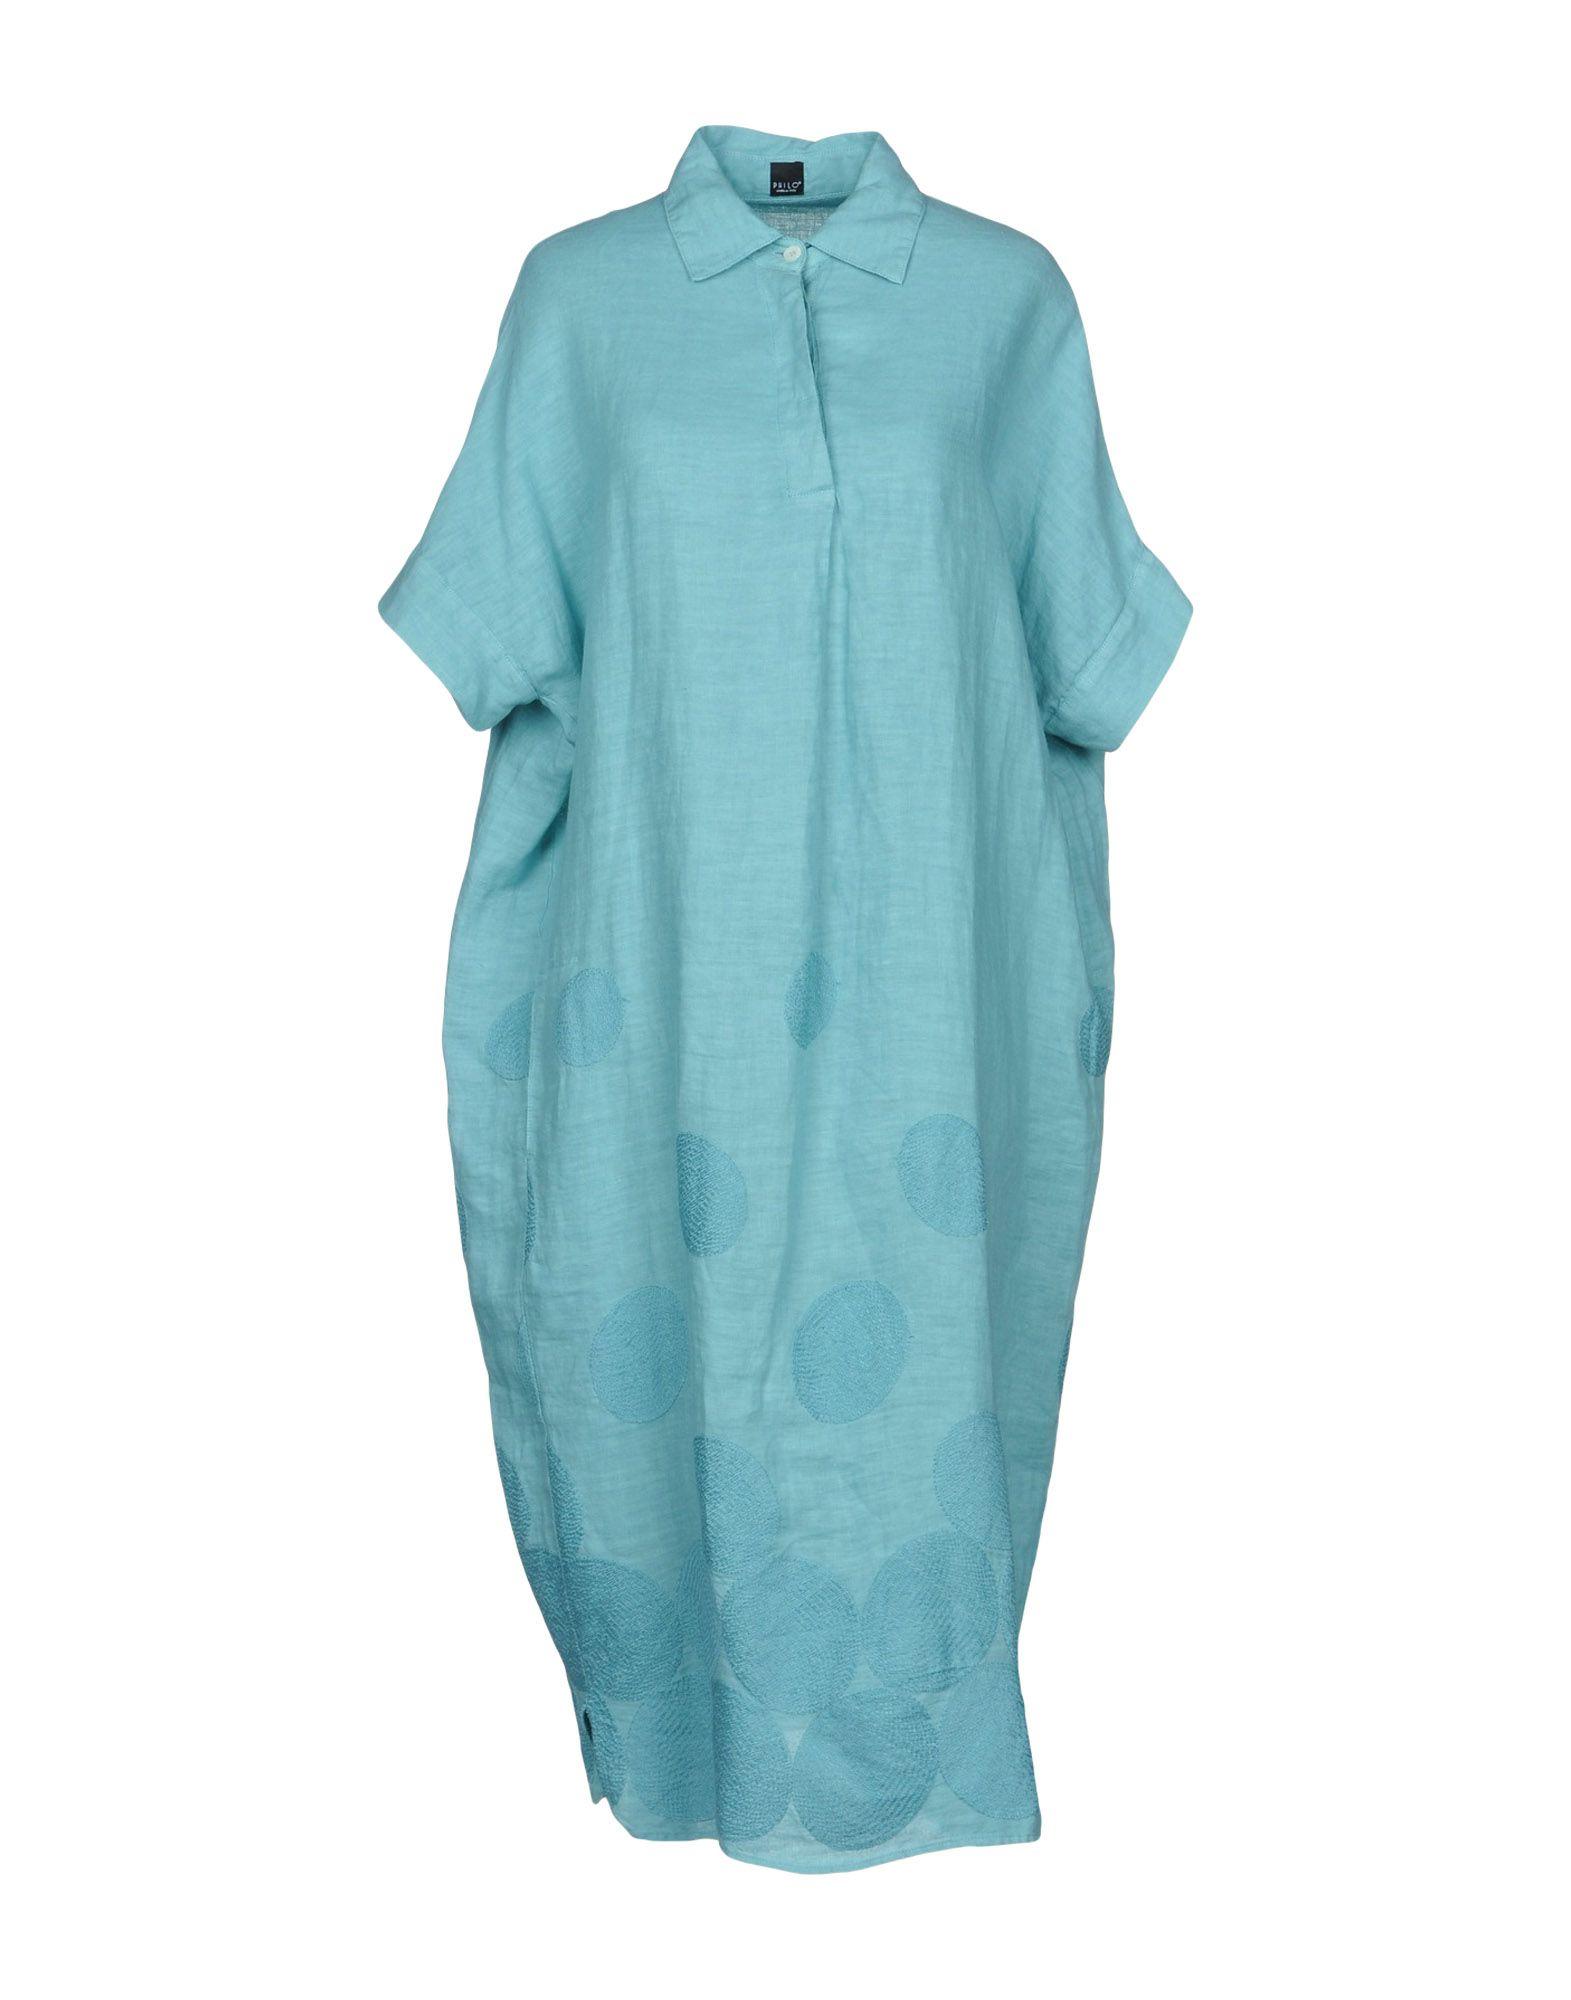 PHILO by MANGOLINI CONFEZIONI Платье до колена philo by mangolini confezioni платье до колена